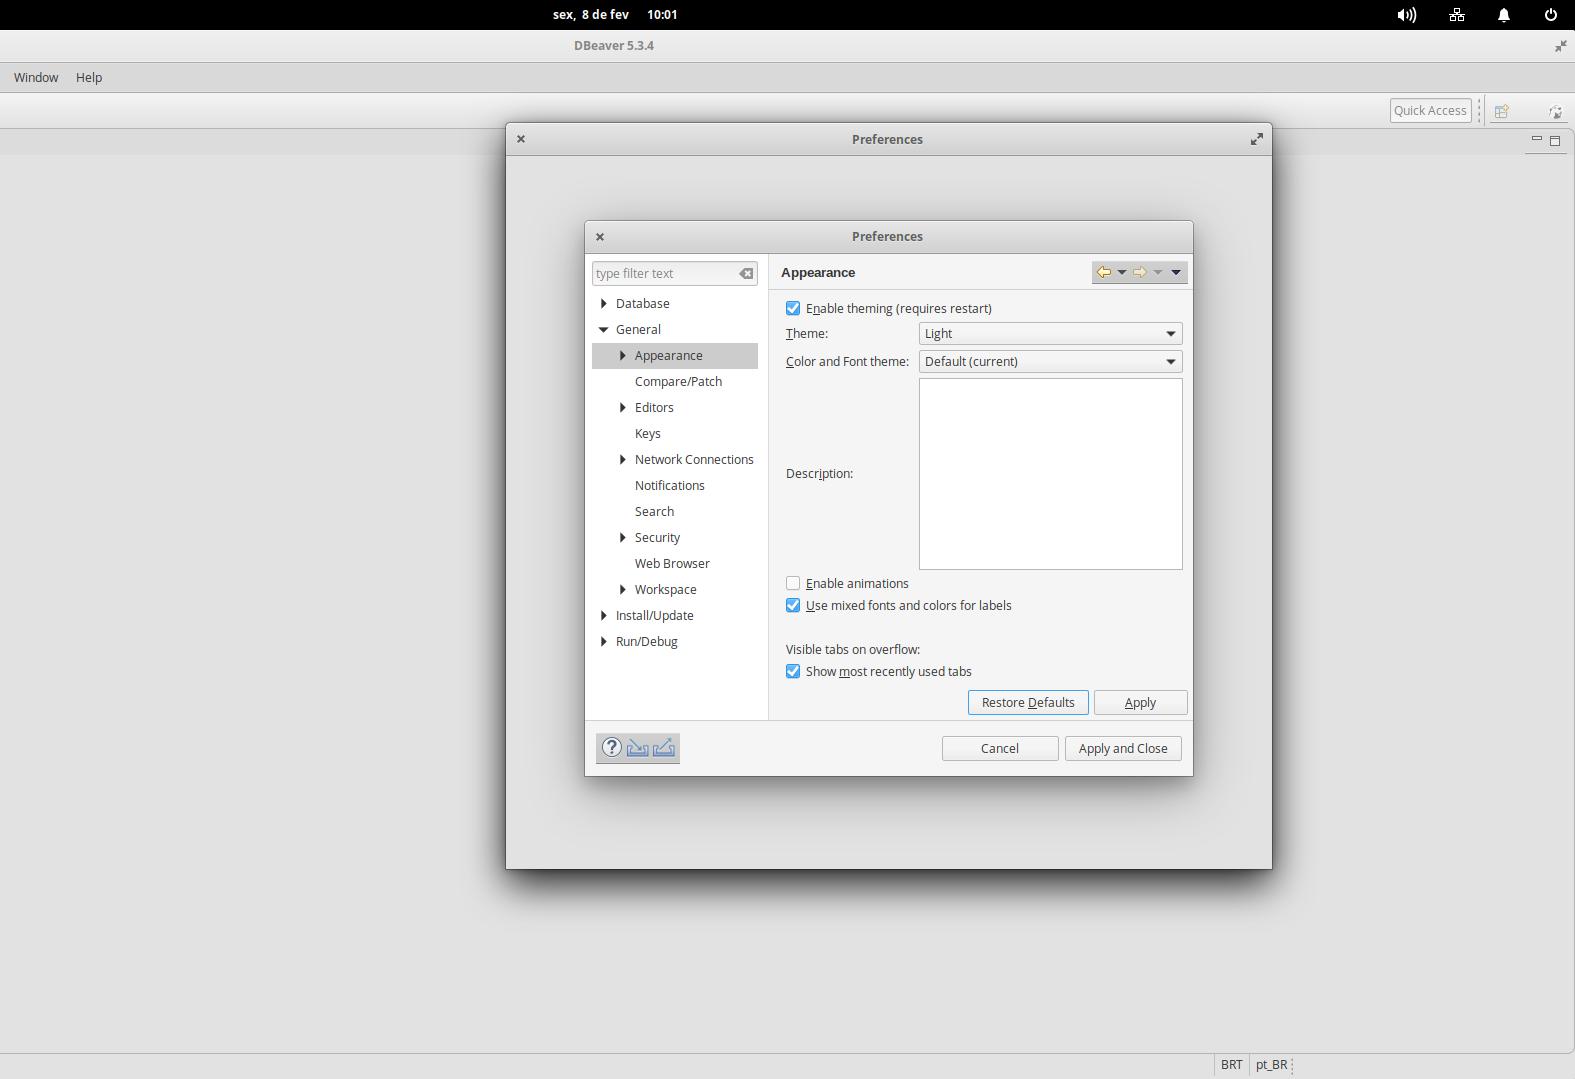 DBeaver on elementary OS 5 0 Juno · Issue #5239 · dbeaver/dbeaver